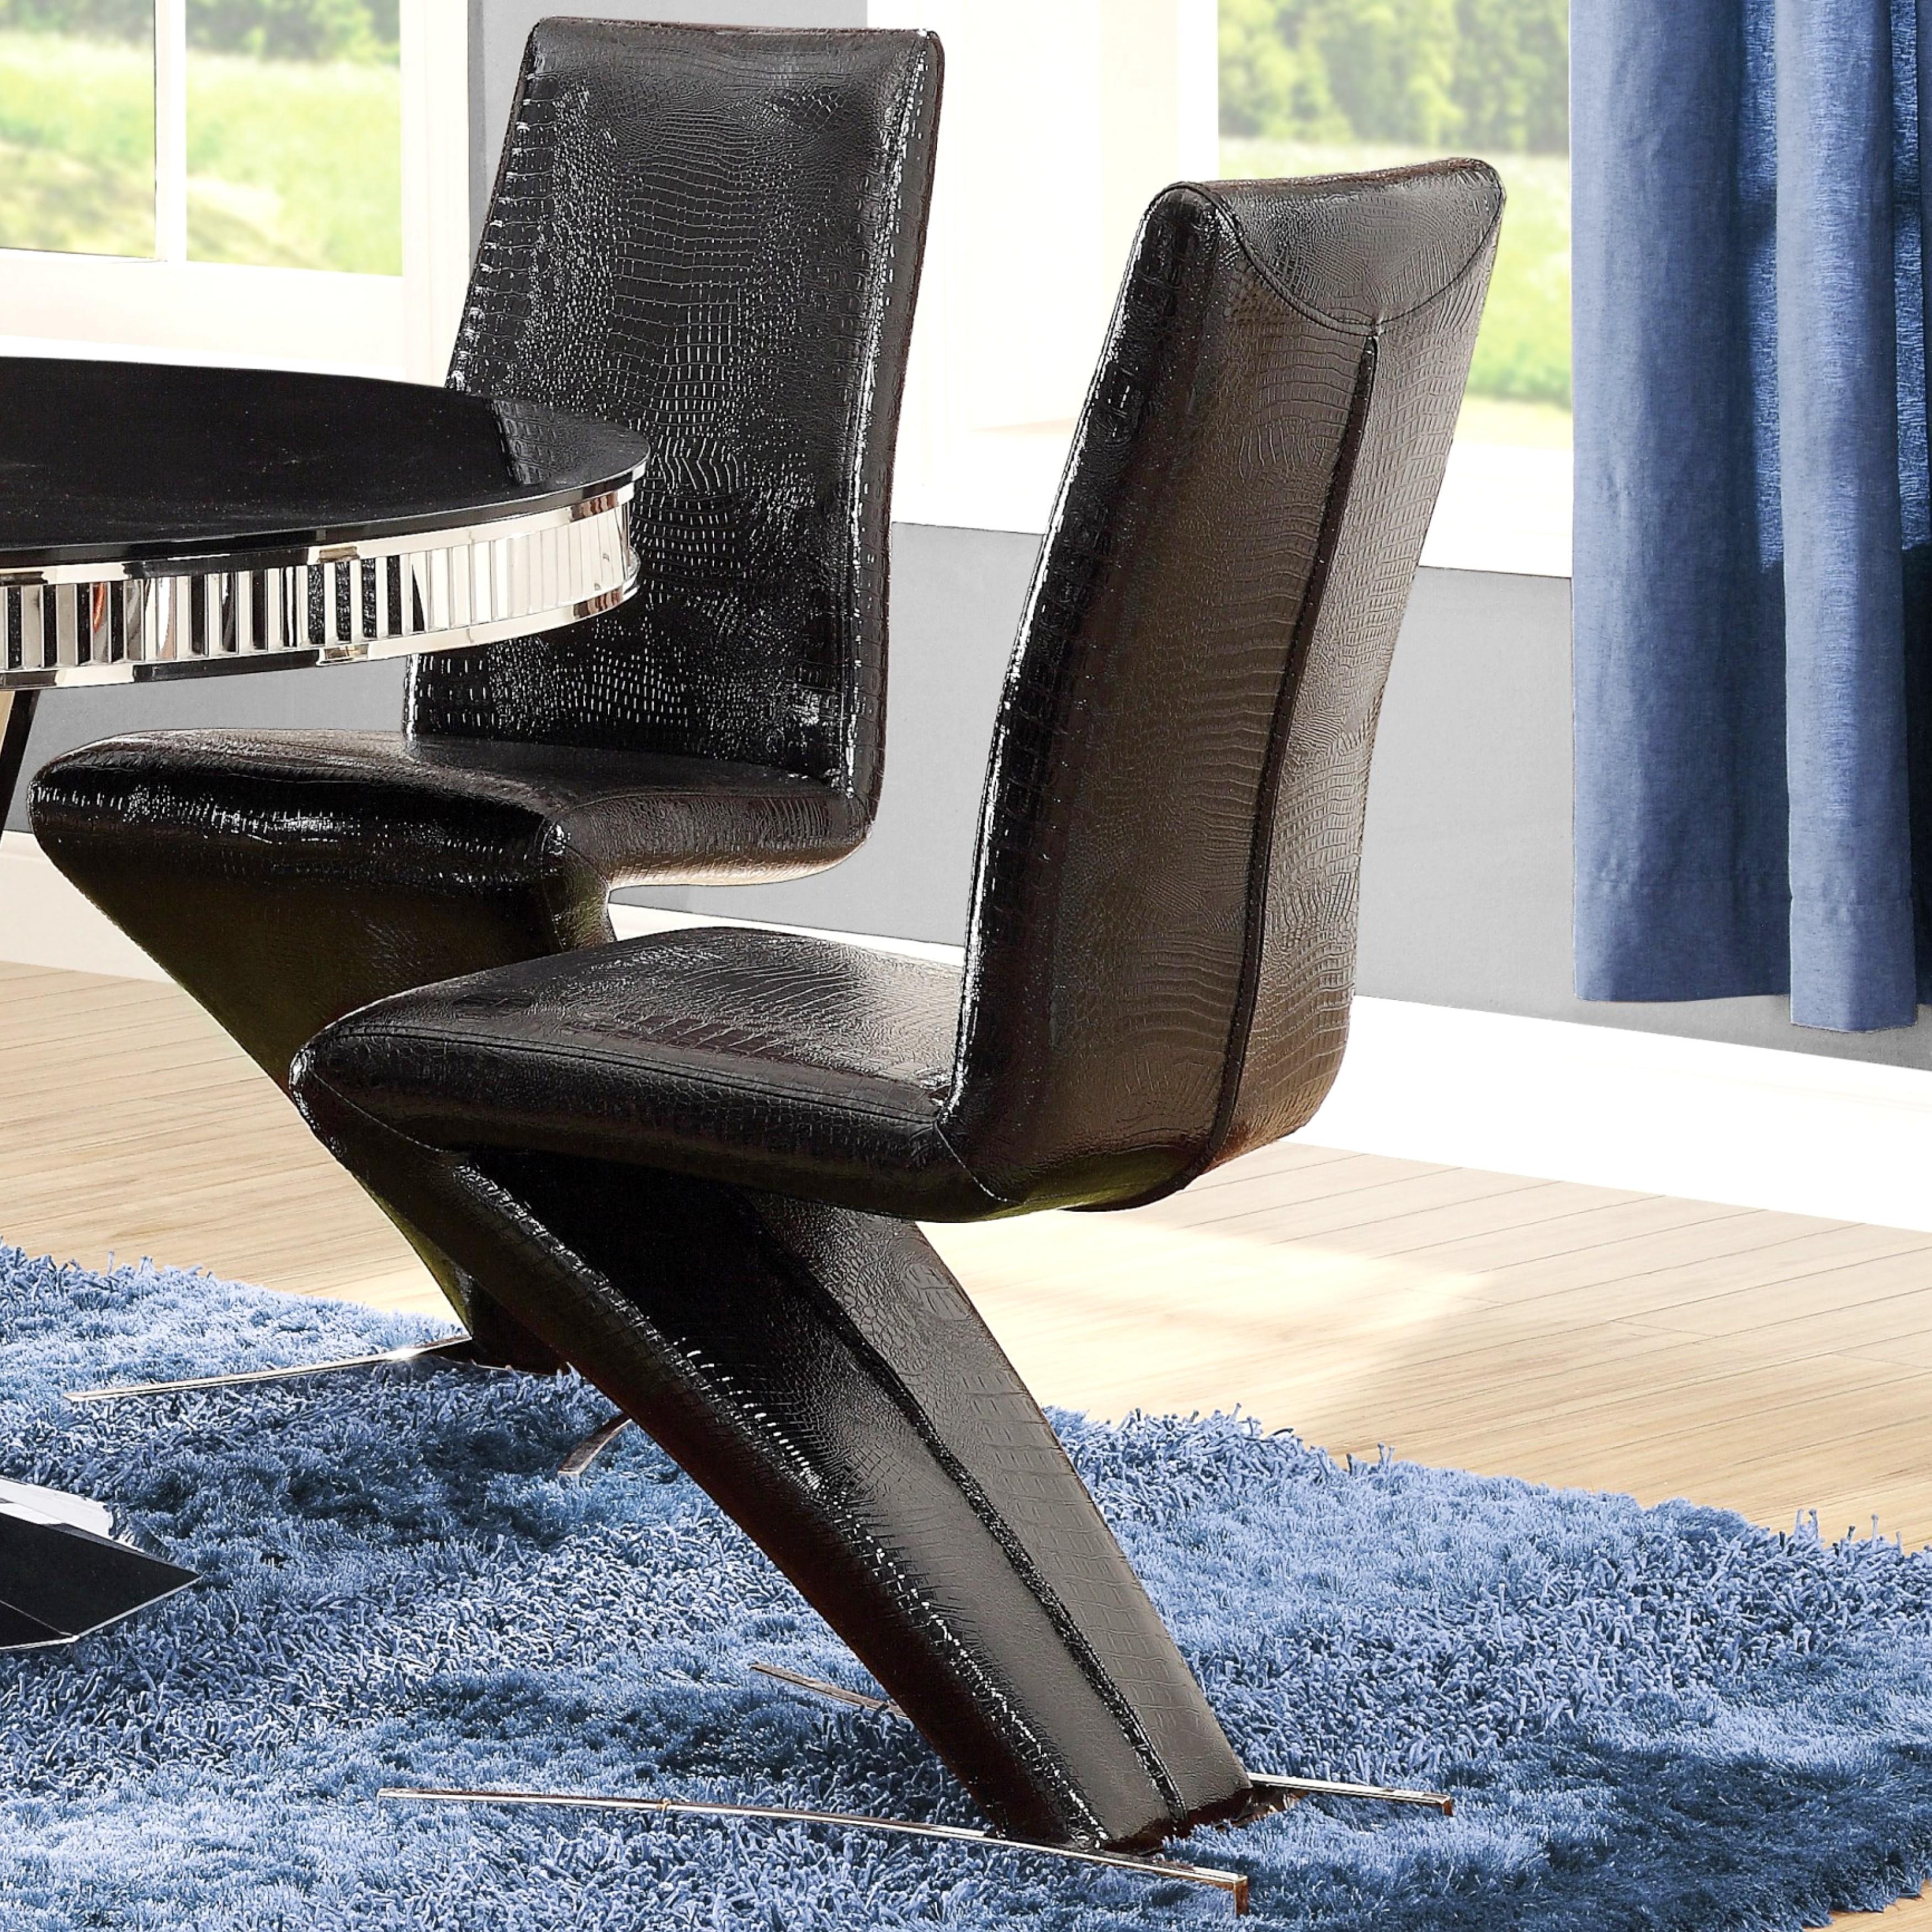 Mermaid Design Crocodile Upholstered Dining Chairs (Set o...